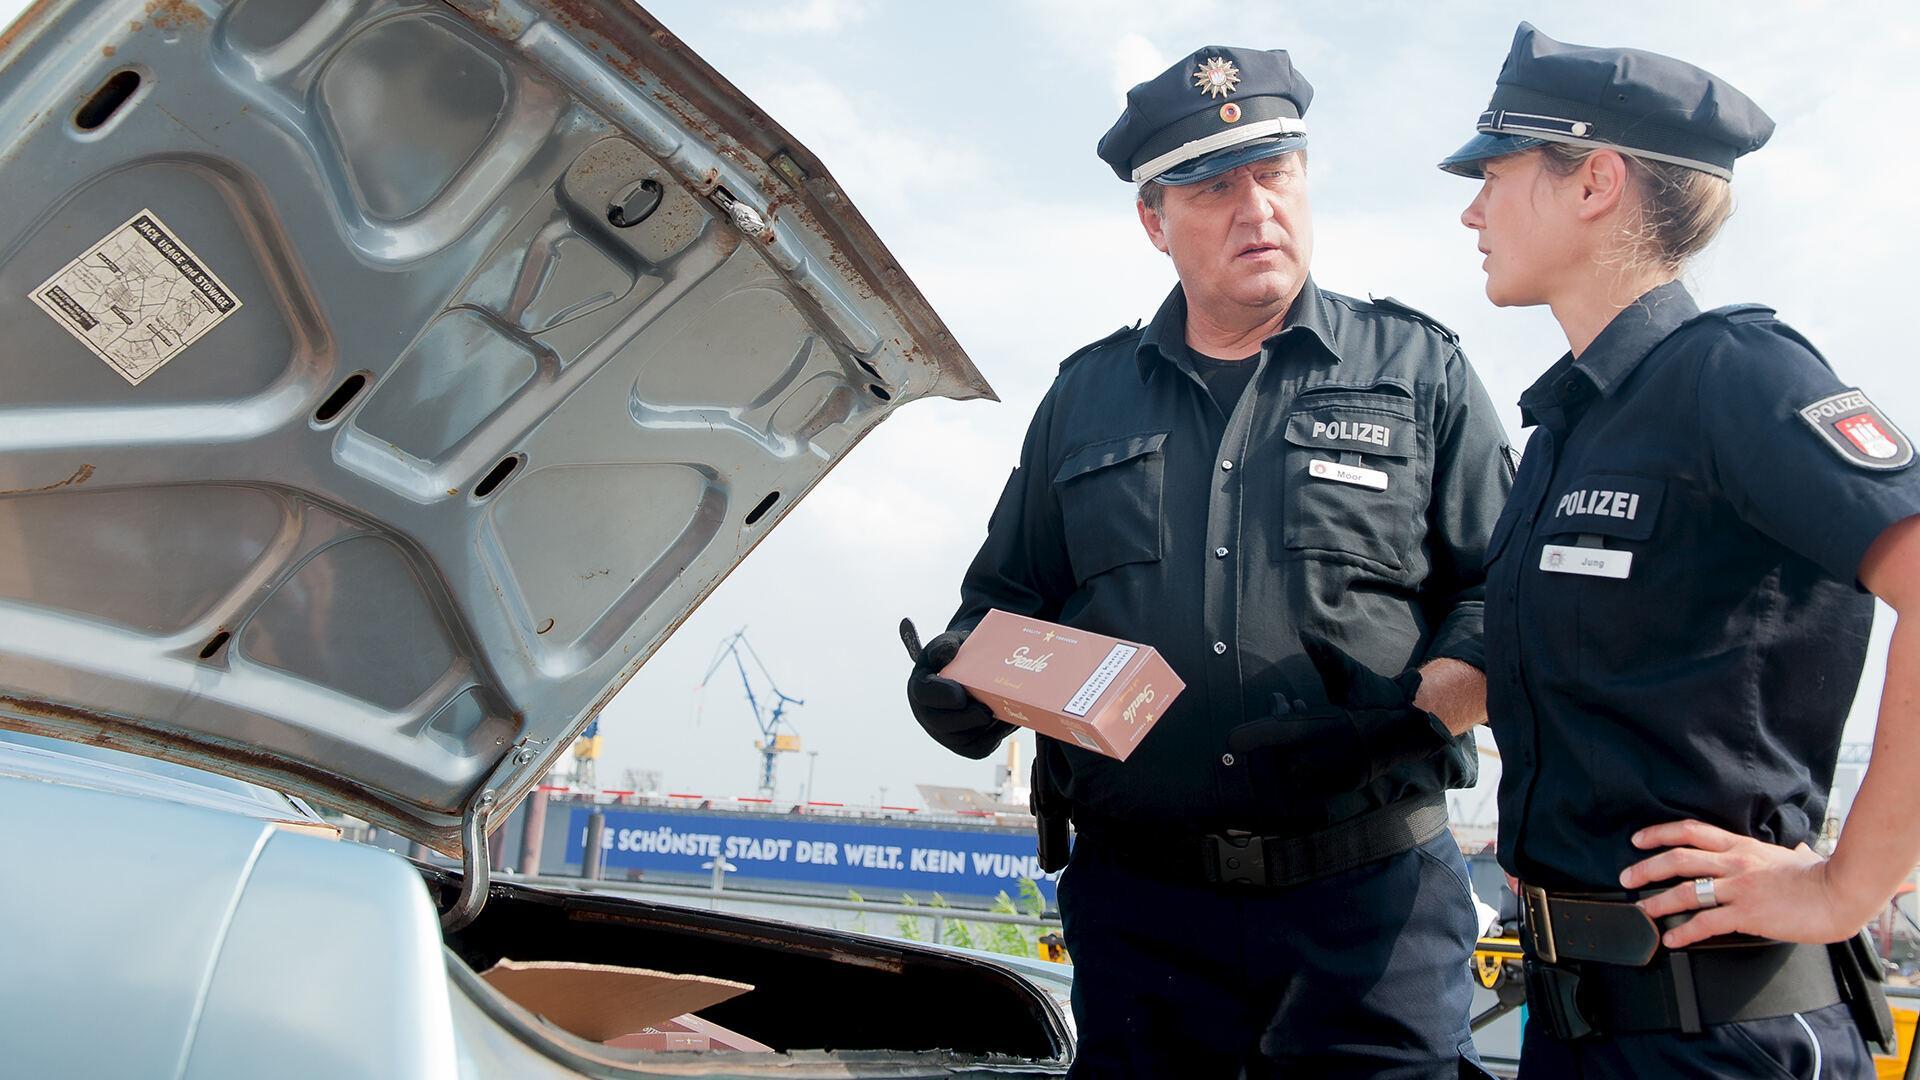 Premium Crime Hamburg Distretto 21